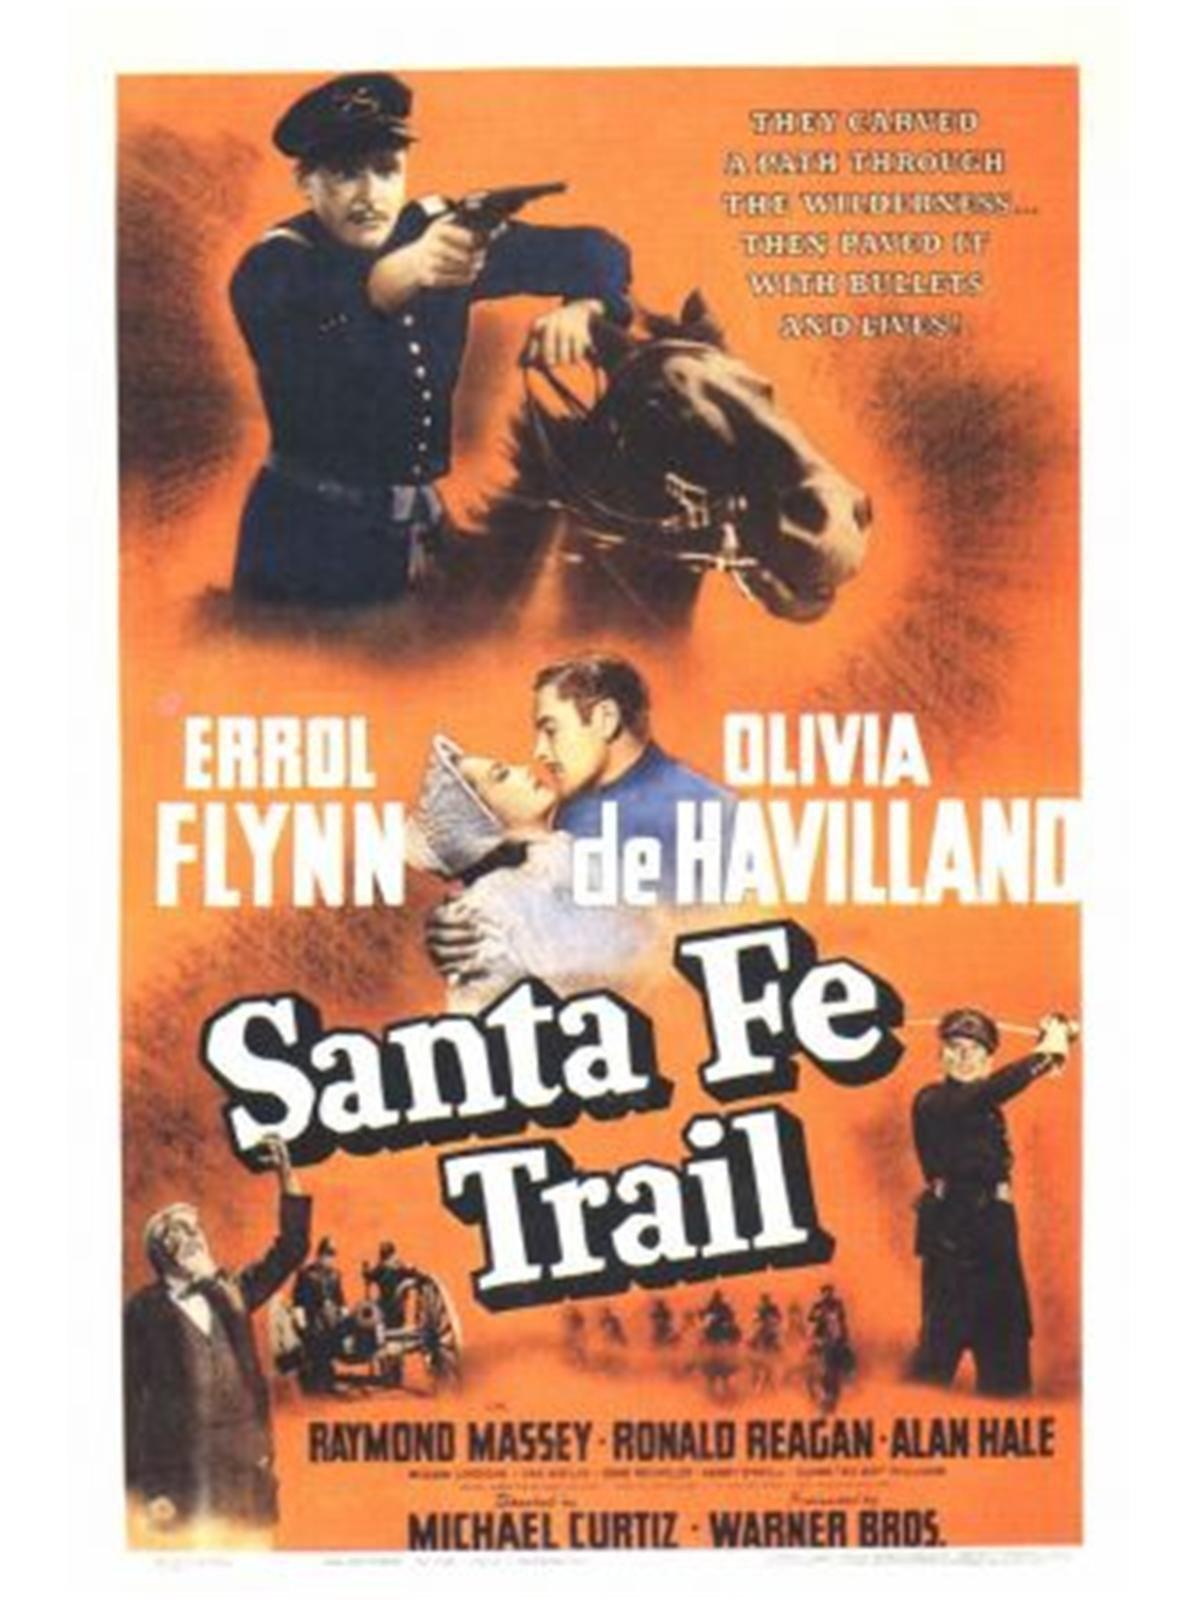 The Sante Fe Trail